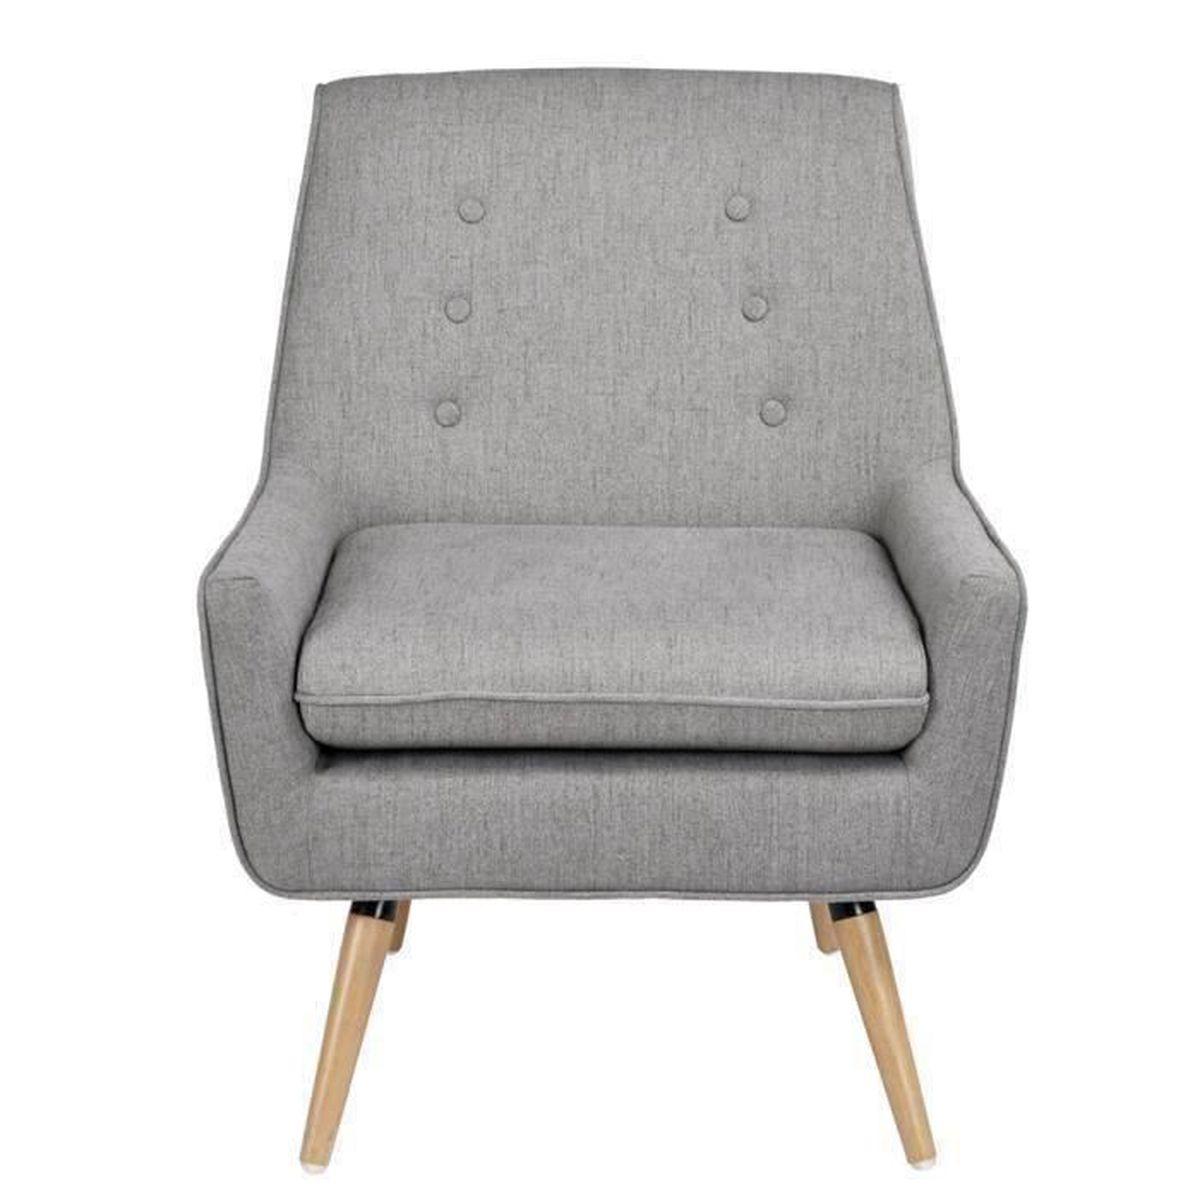 FurnitureR Chaise Chauffeuse Cocktail Scandinave en Tissu et